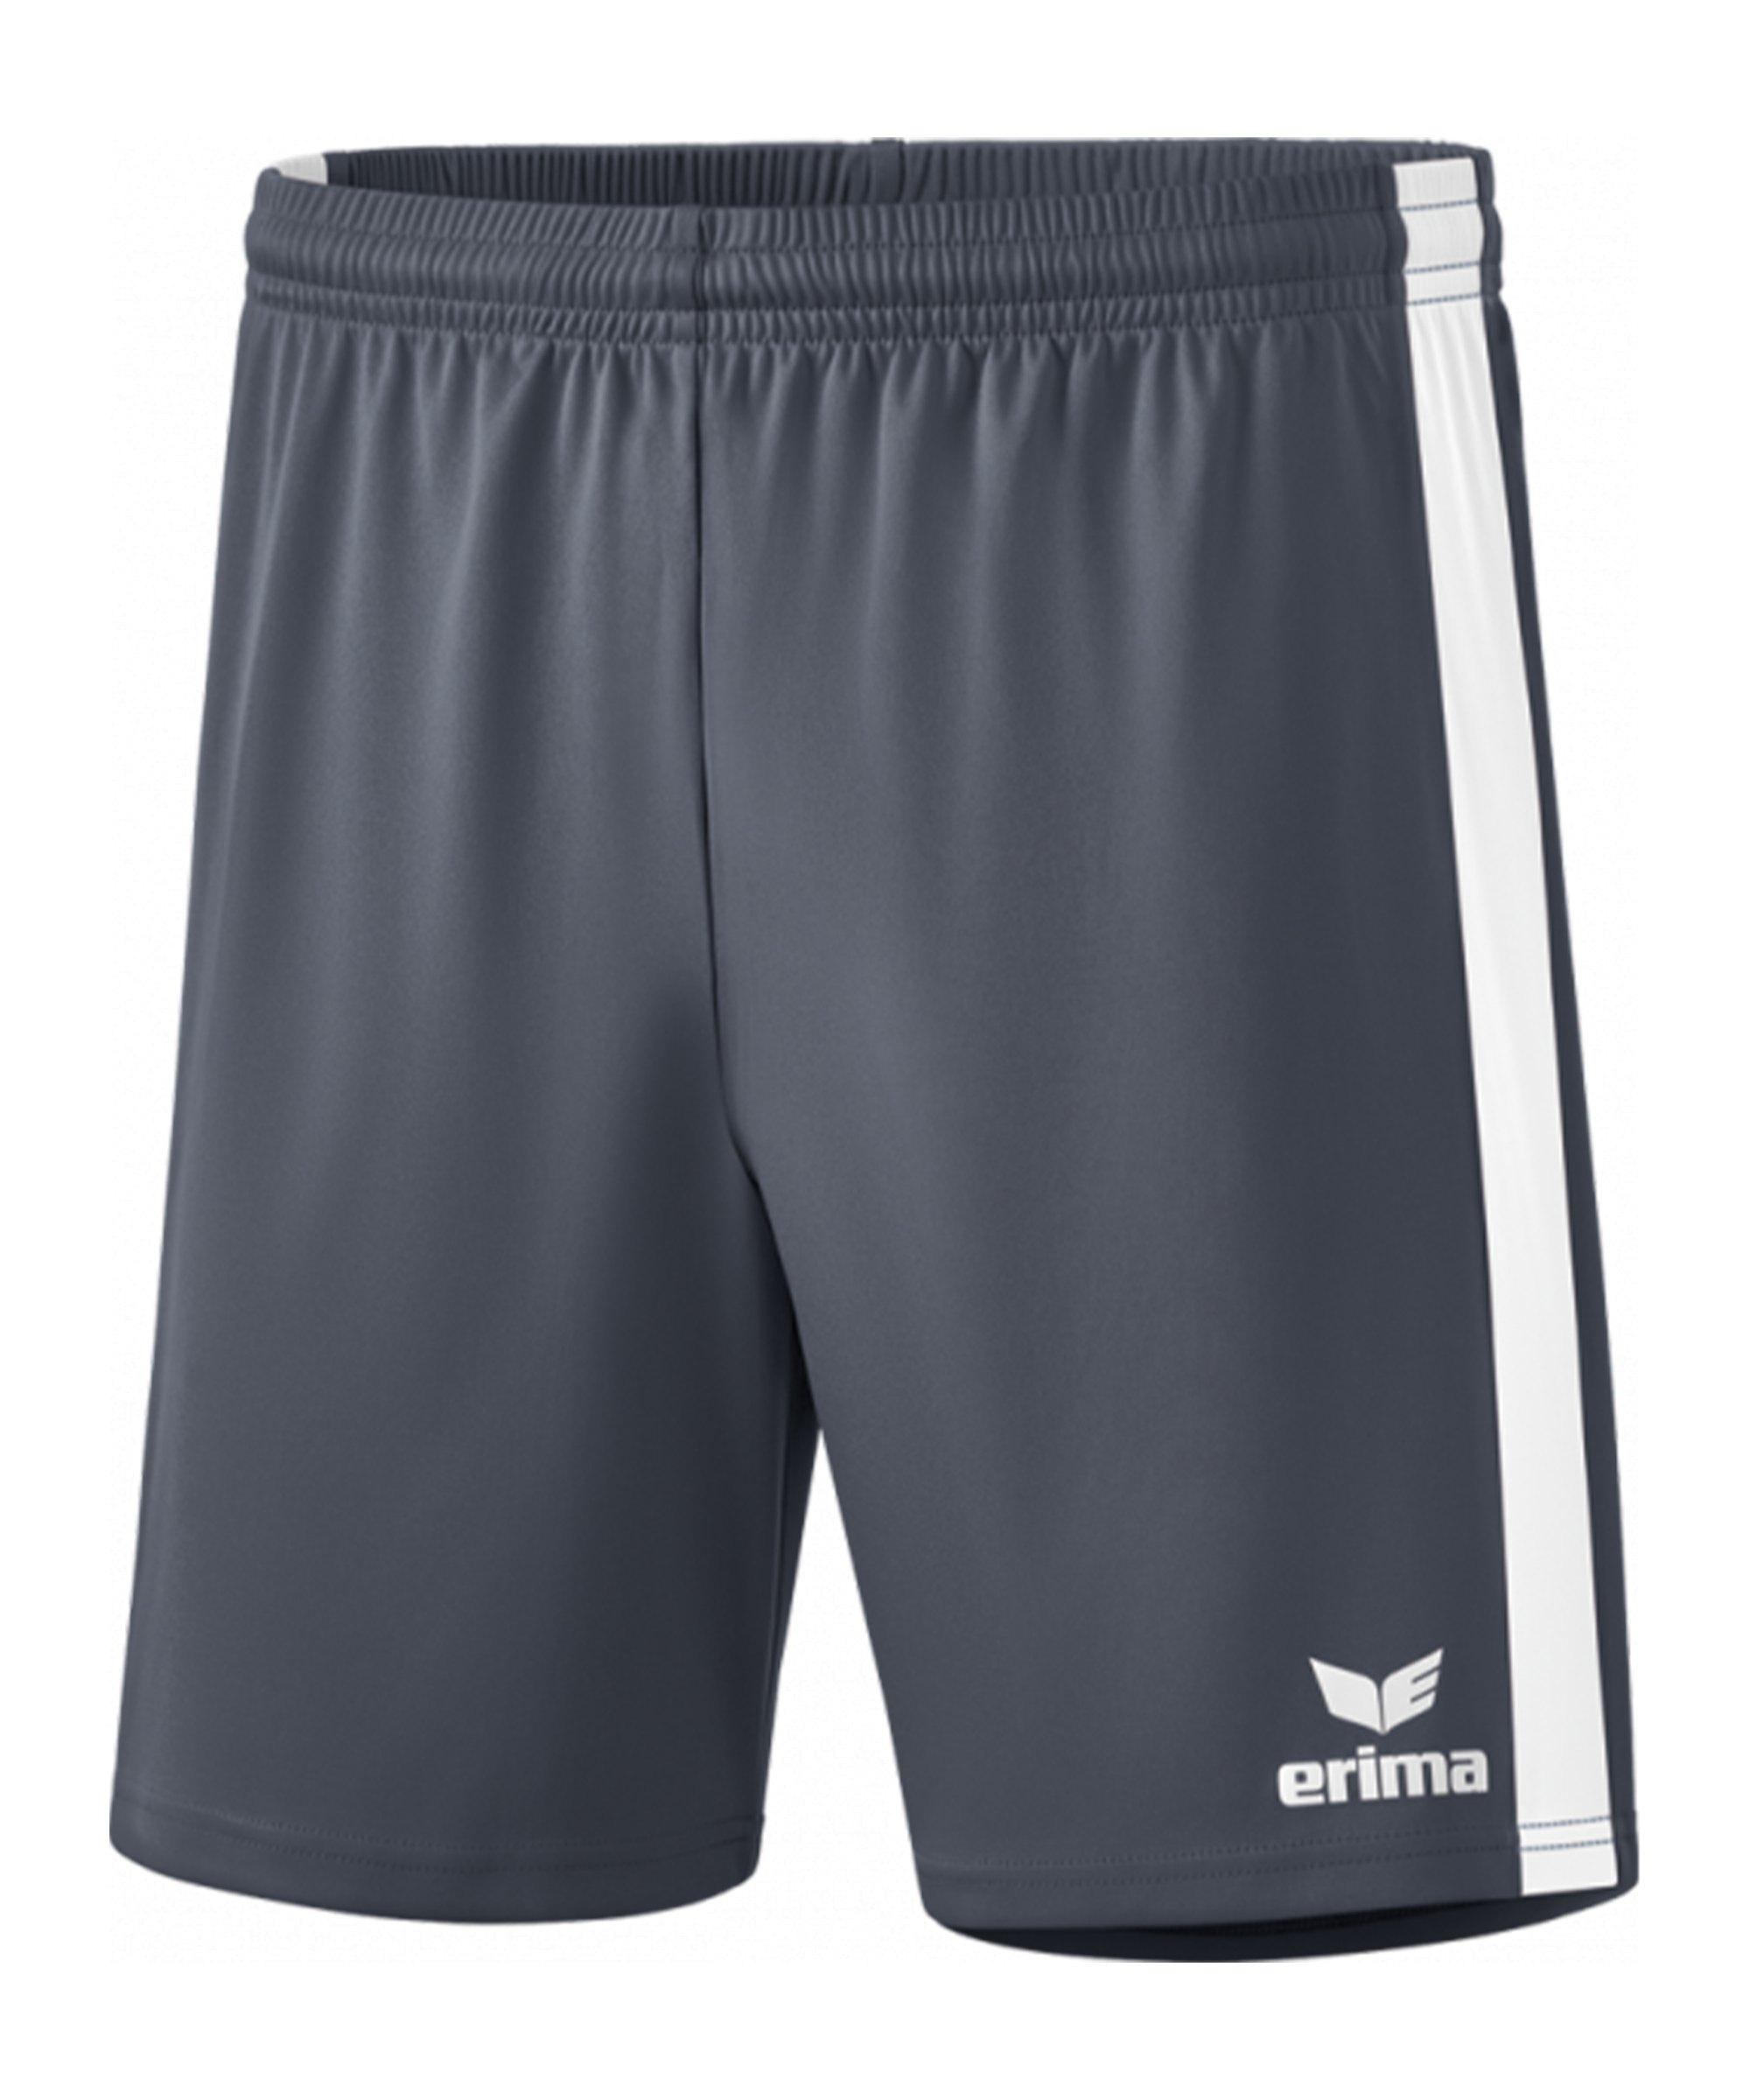 Erima Retro Star Short Grau Weiss - grau